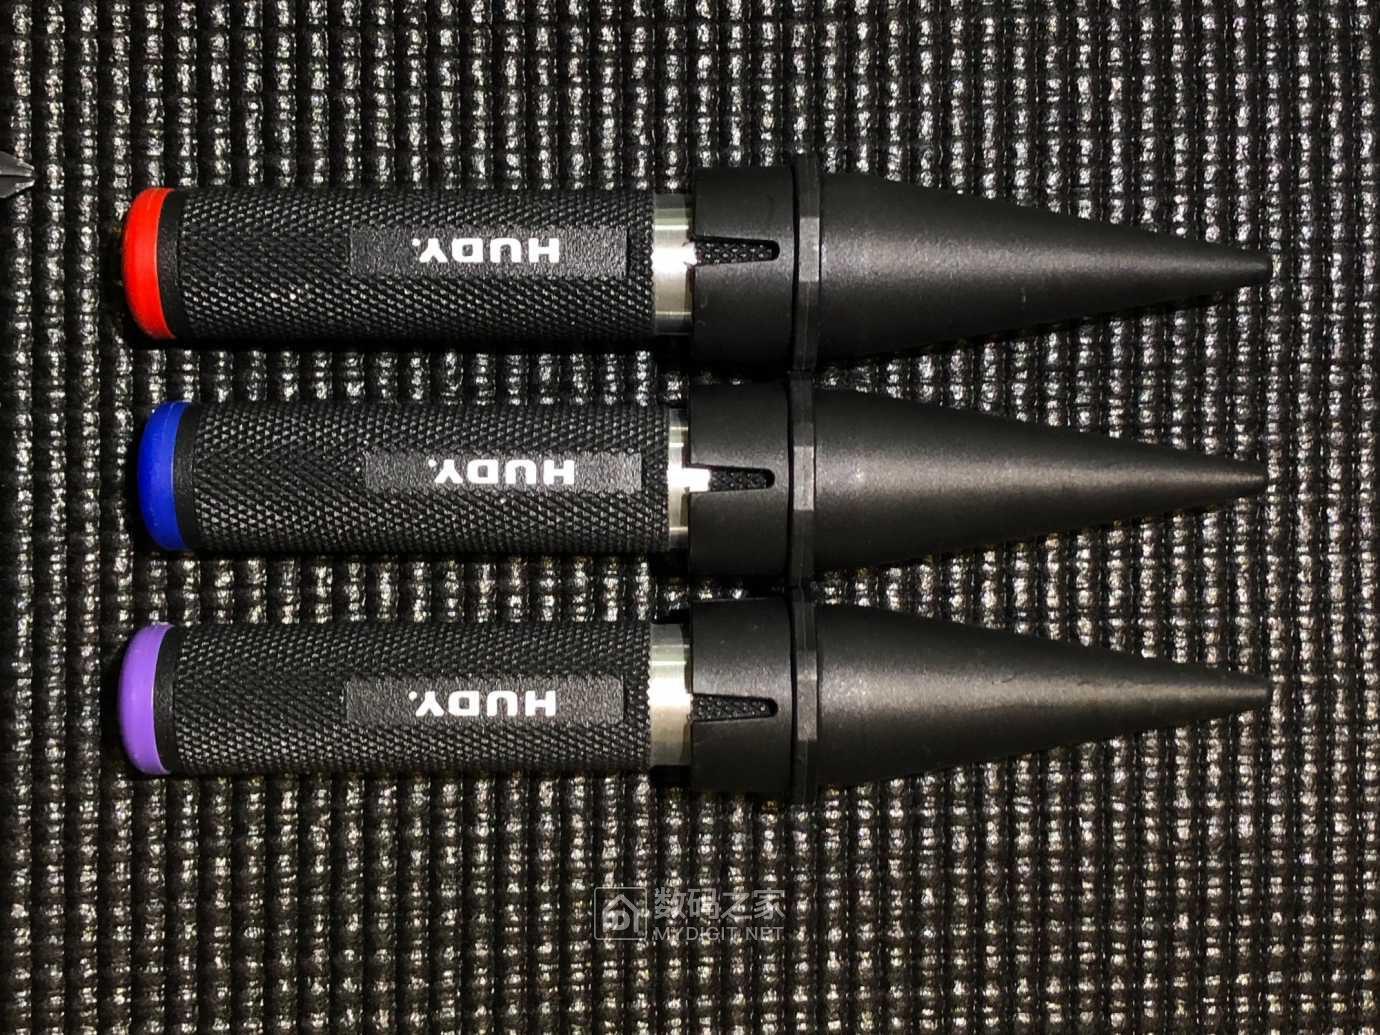 0CA99E9E-6007-4AA7-902D-835952A67E9B.jpeg